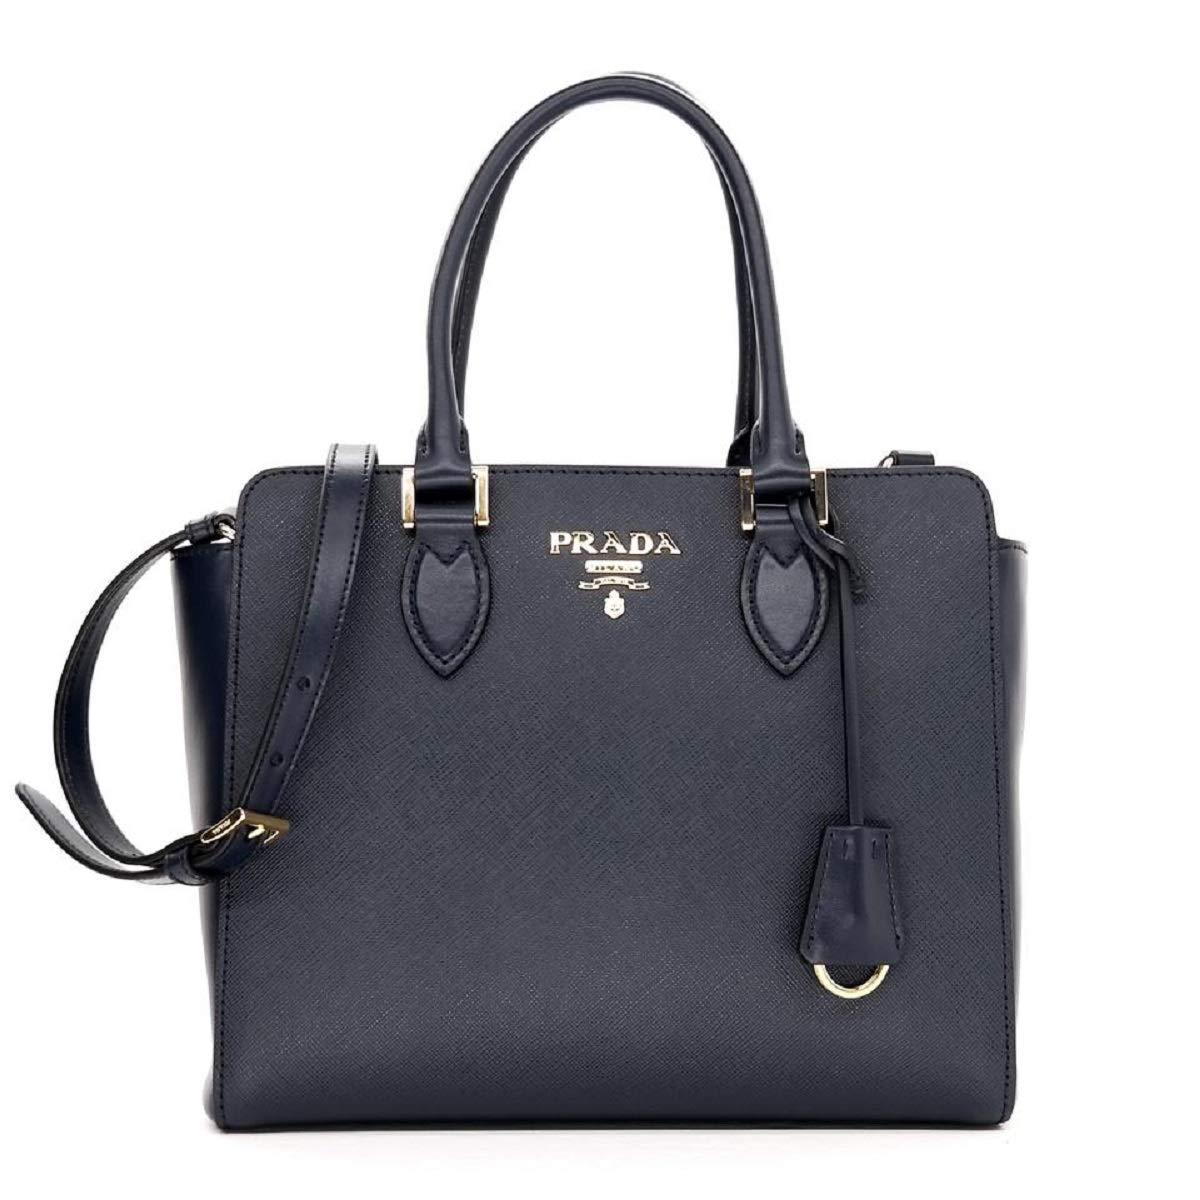 123066c32076 Prada Women's Navy Blue Saffiano Lux Leather Handbag 1BA118: Handbags:  Amazon.com